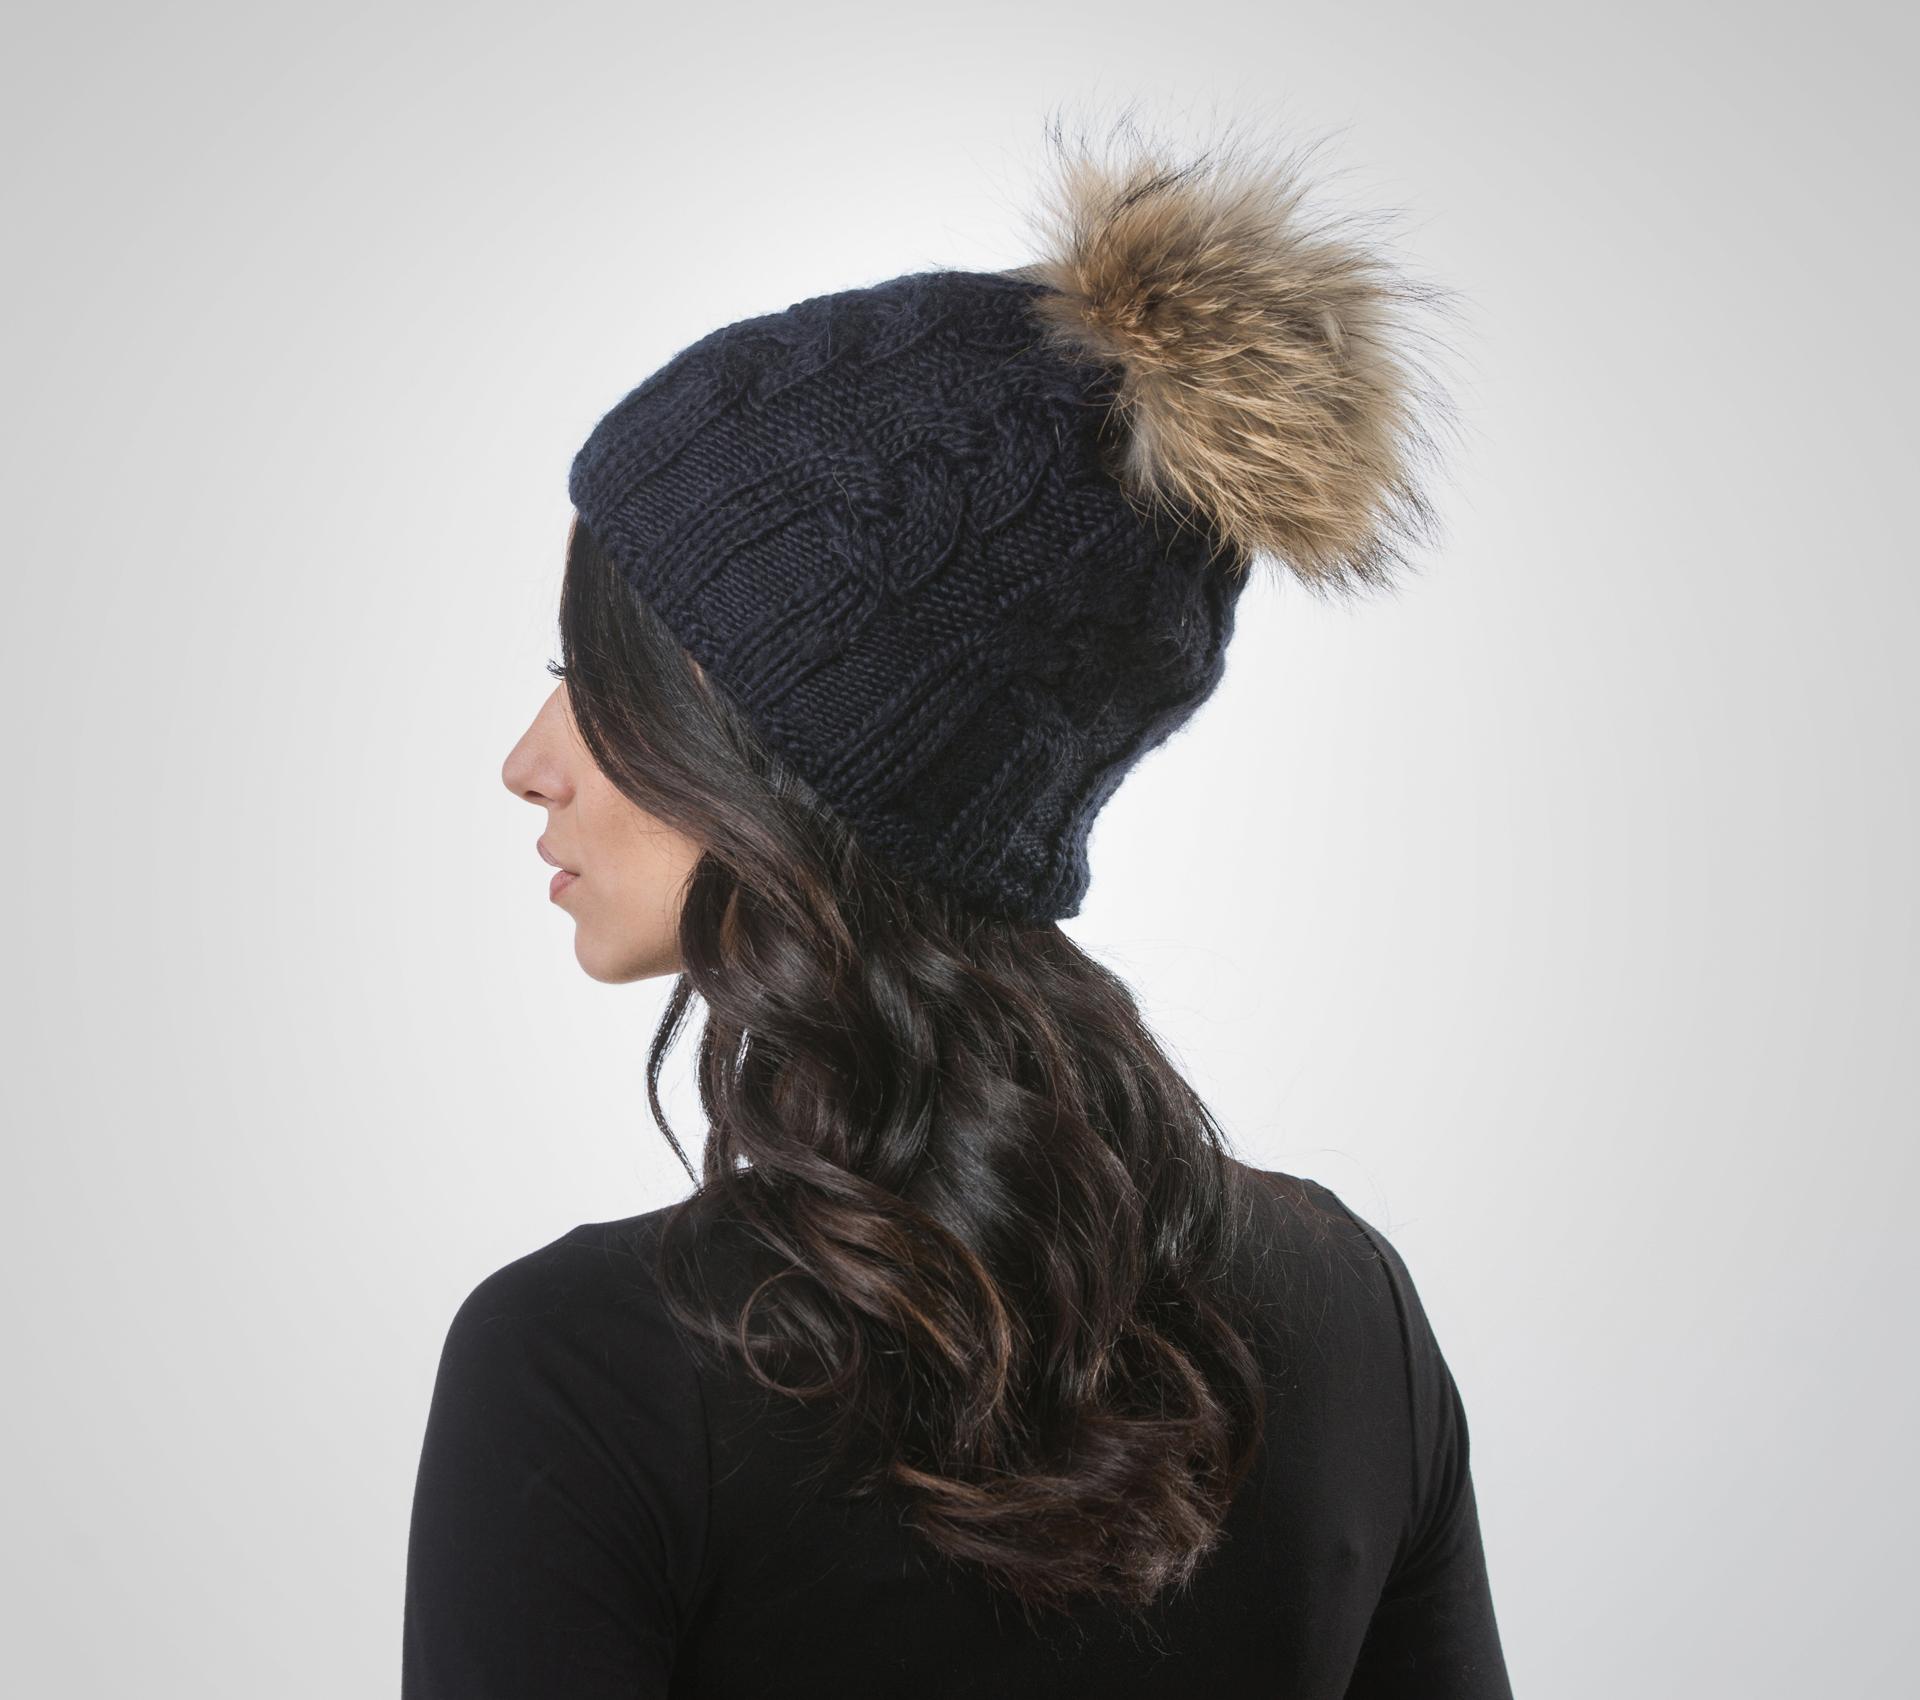 Dark Blue Beanie Raccoon Pom Pom .100% Real Fur Hats - Haute Acorn 0e320e63253